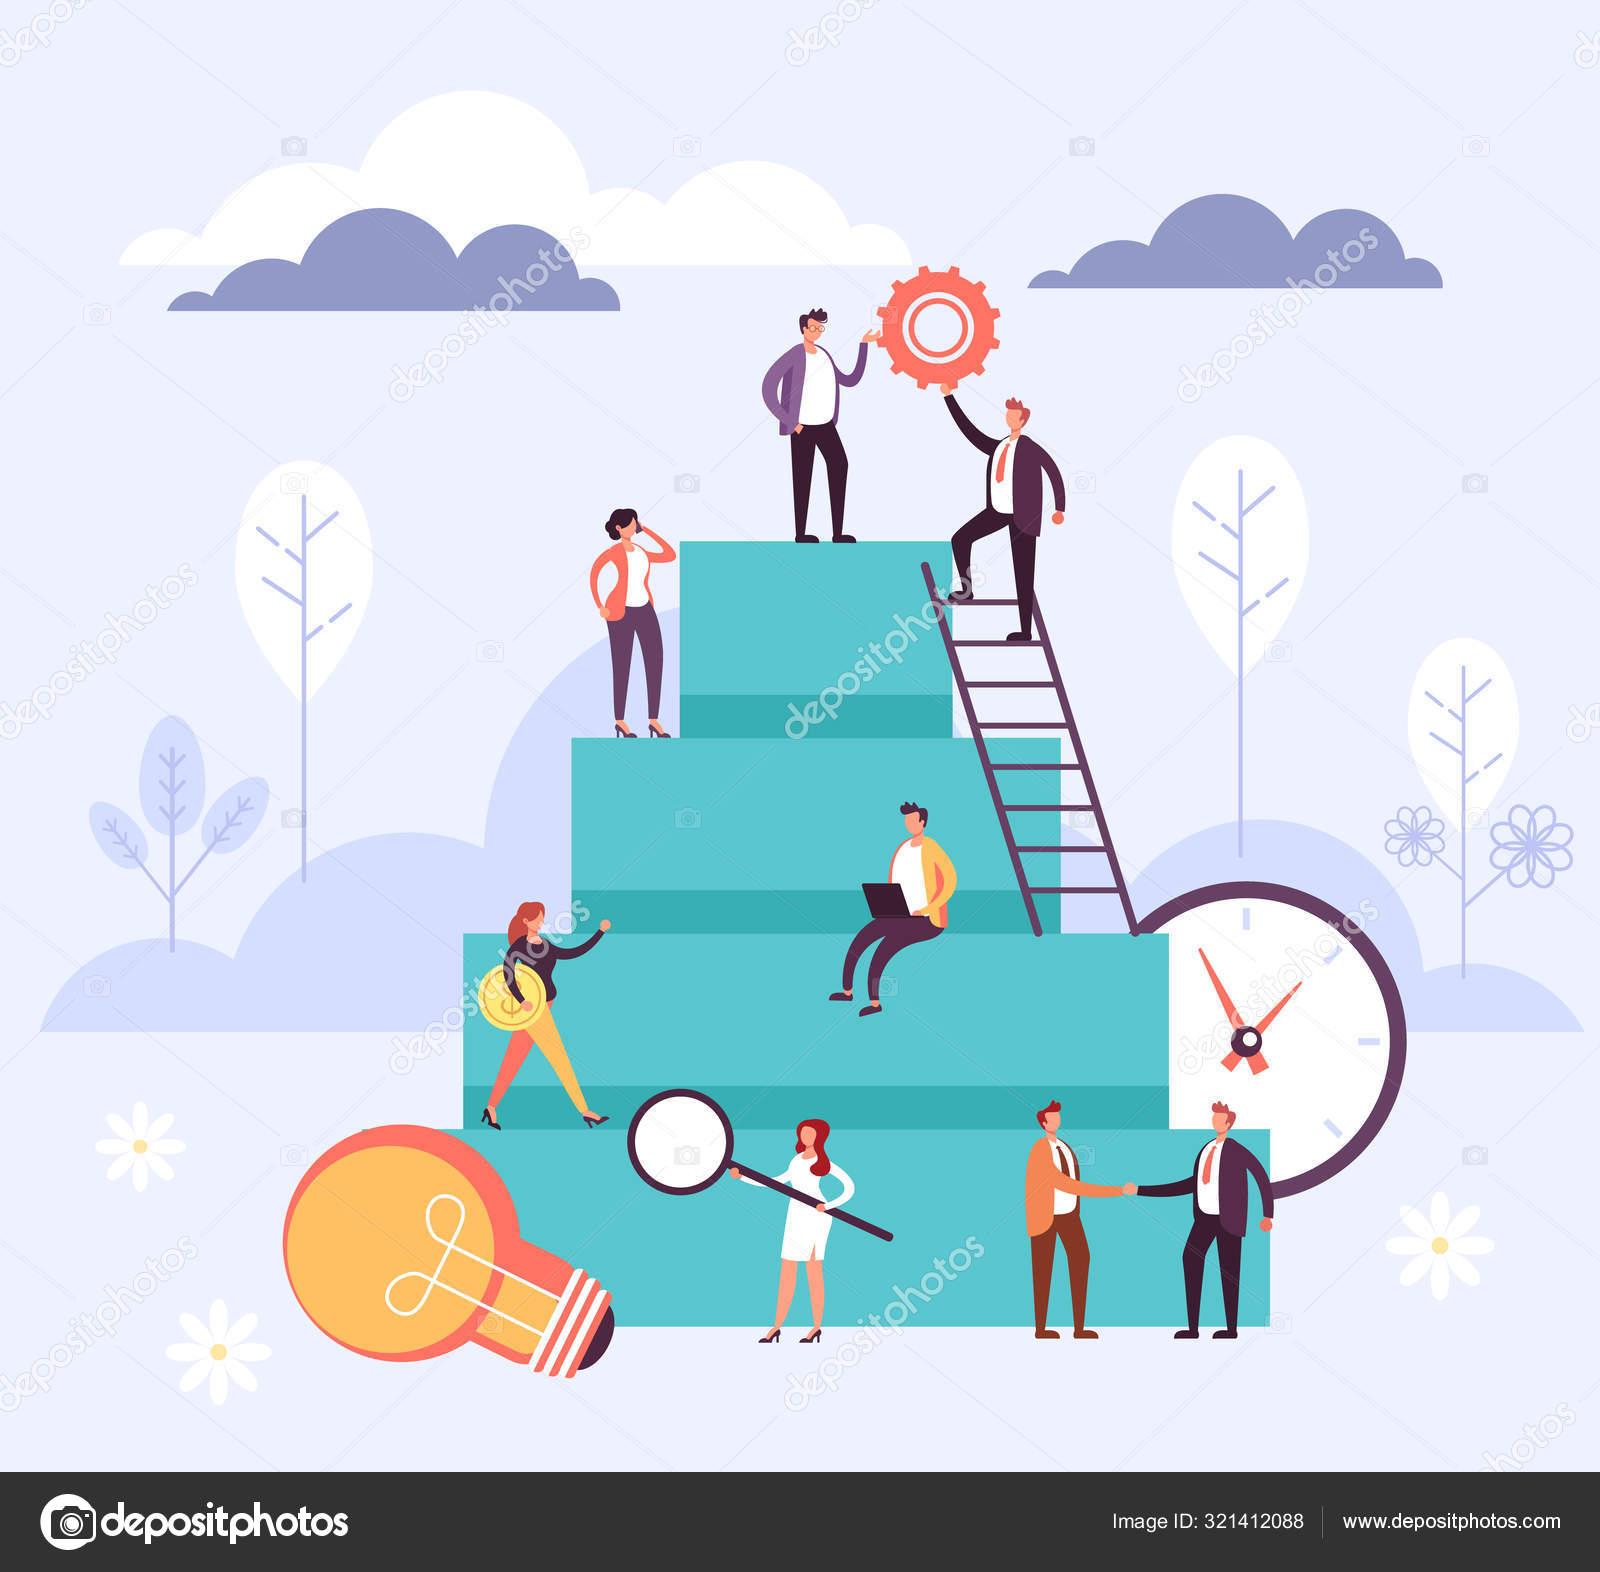 Career Development Office Workers Teamwork Concept Vector Flat Cartoon Graphic Stock Vector C Microbagrandioza 321412088